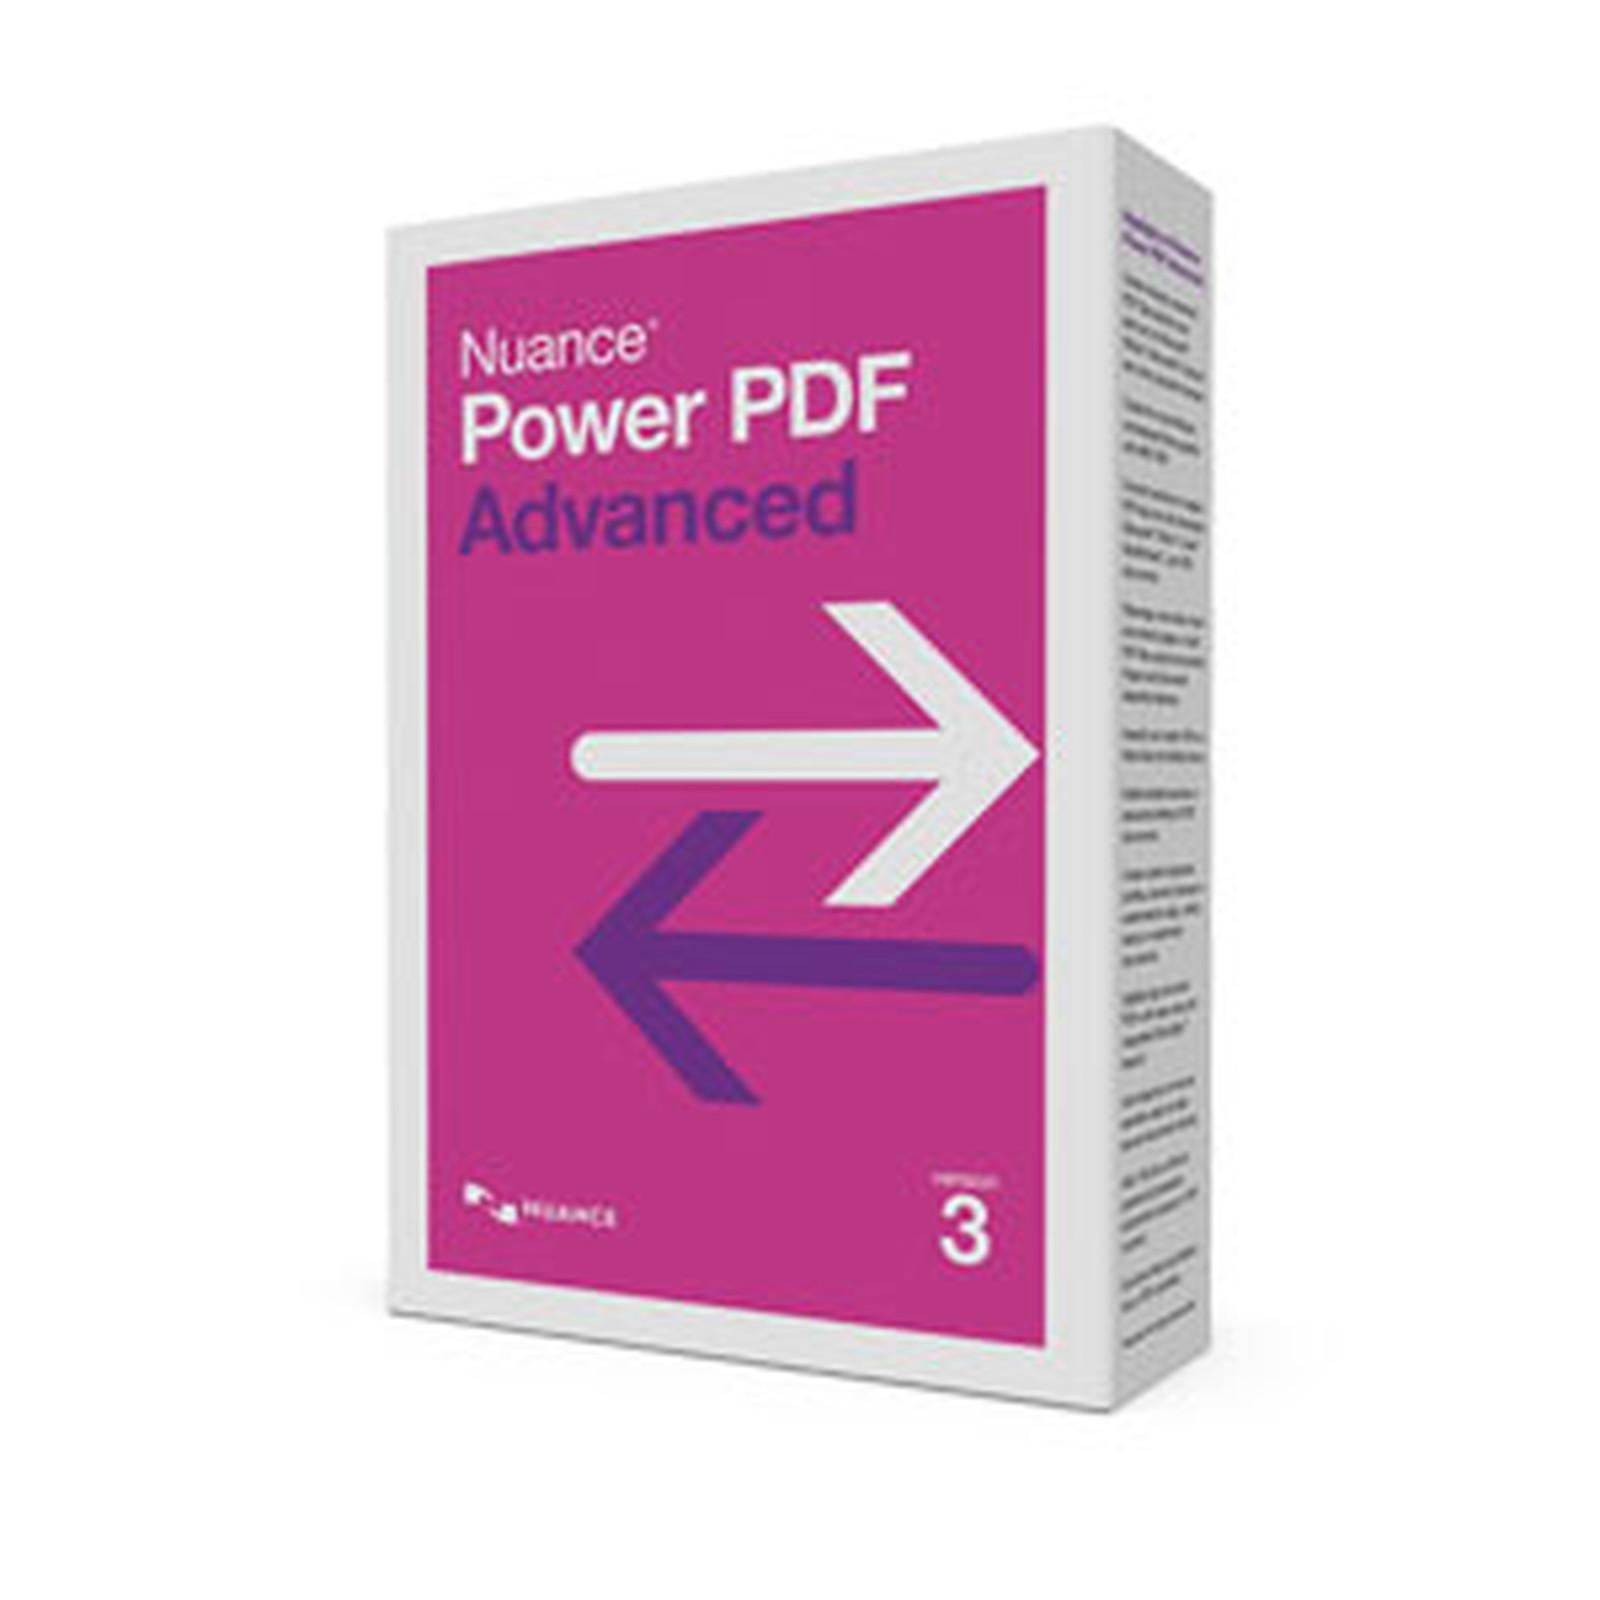 Nuance Power PDF Advanced version 3